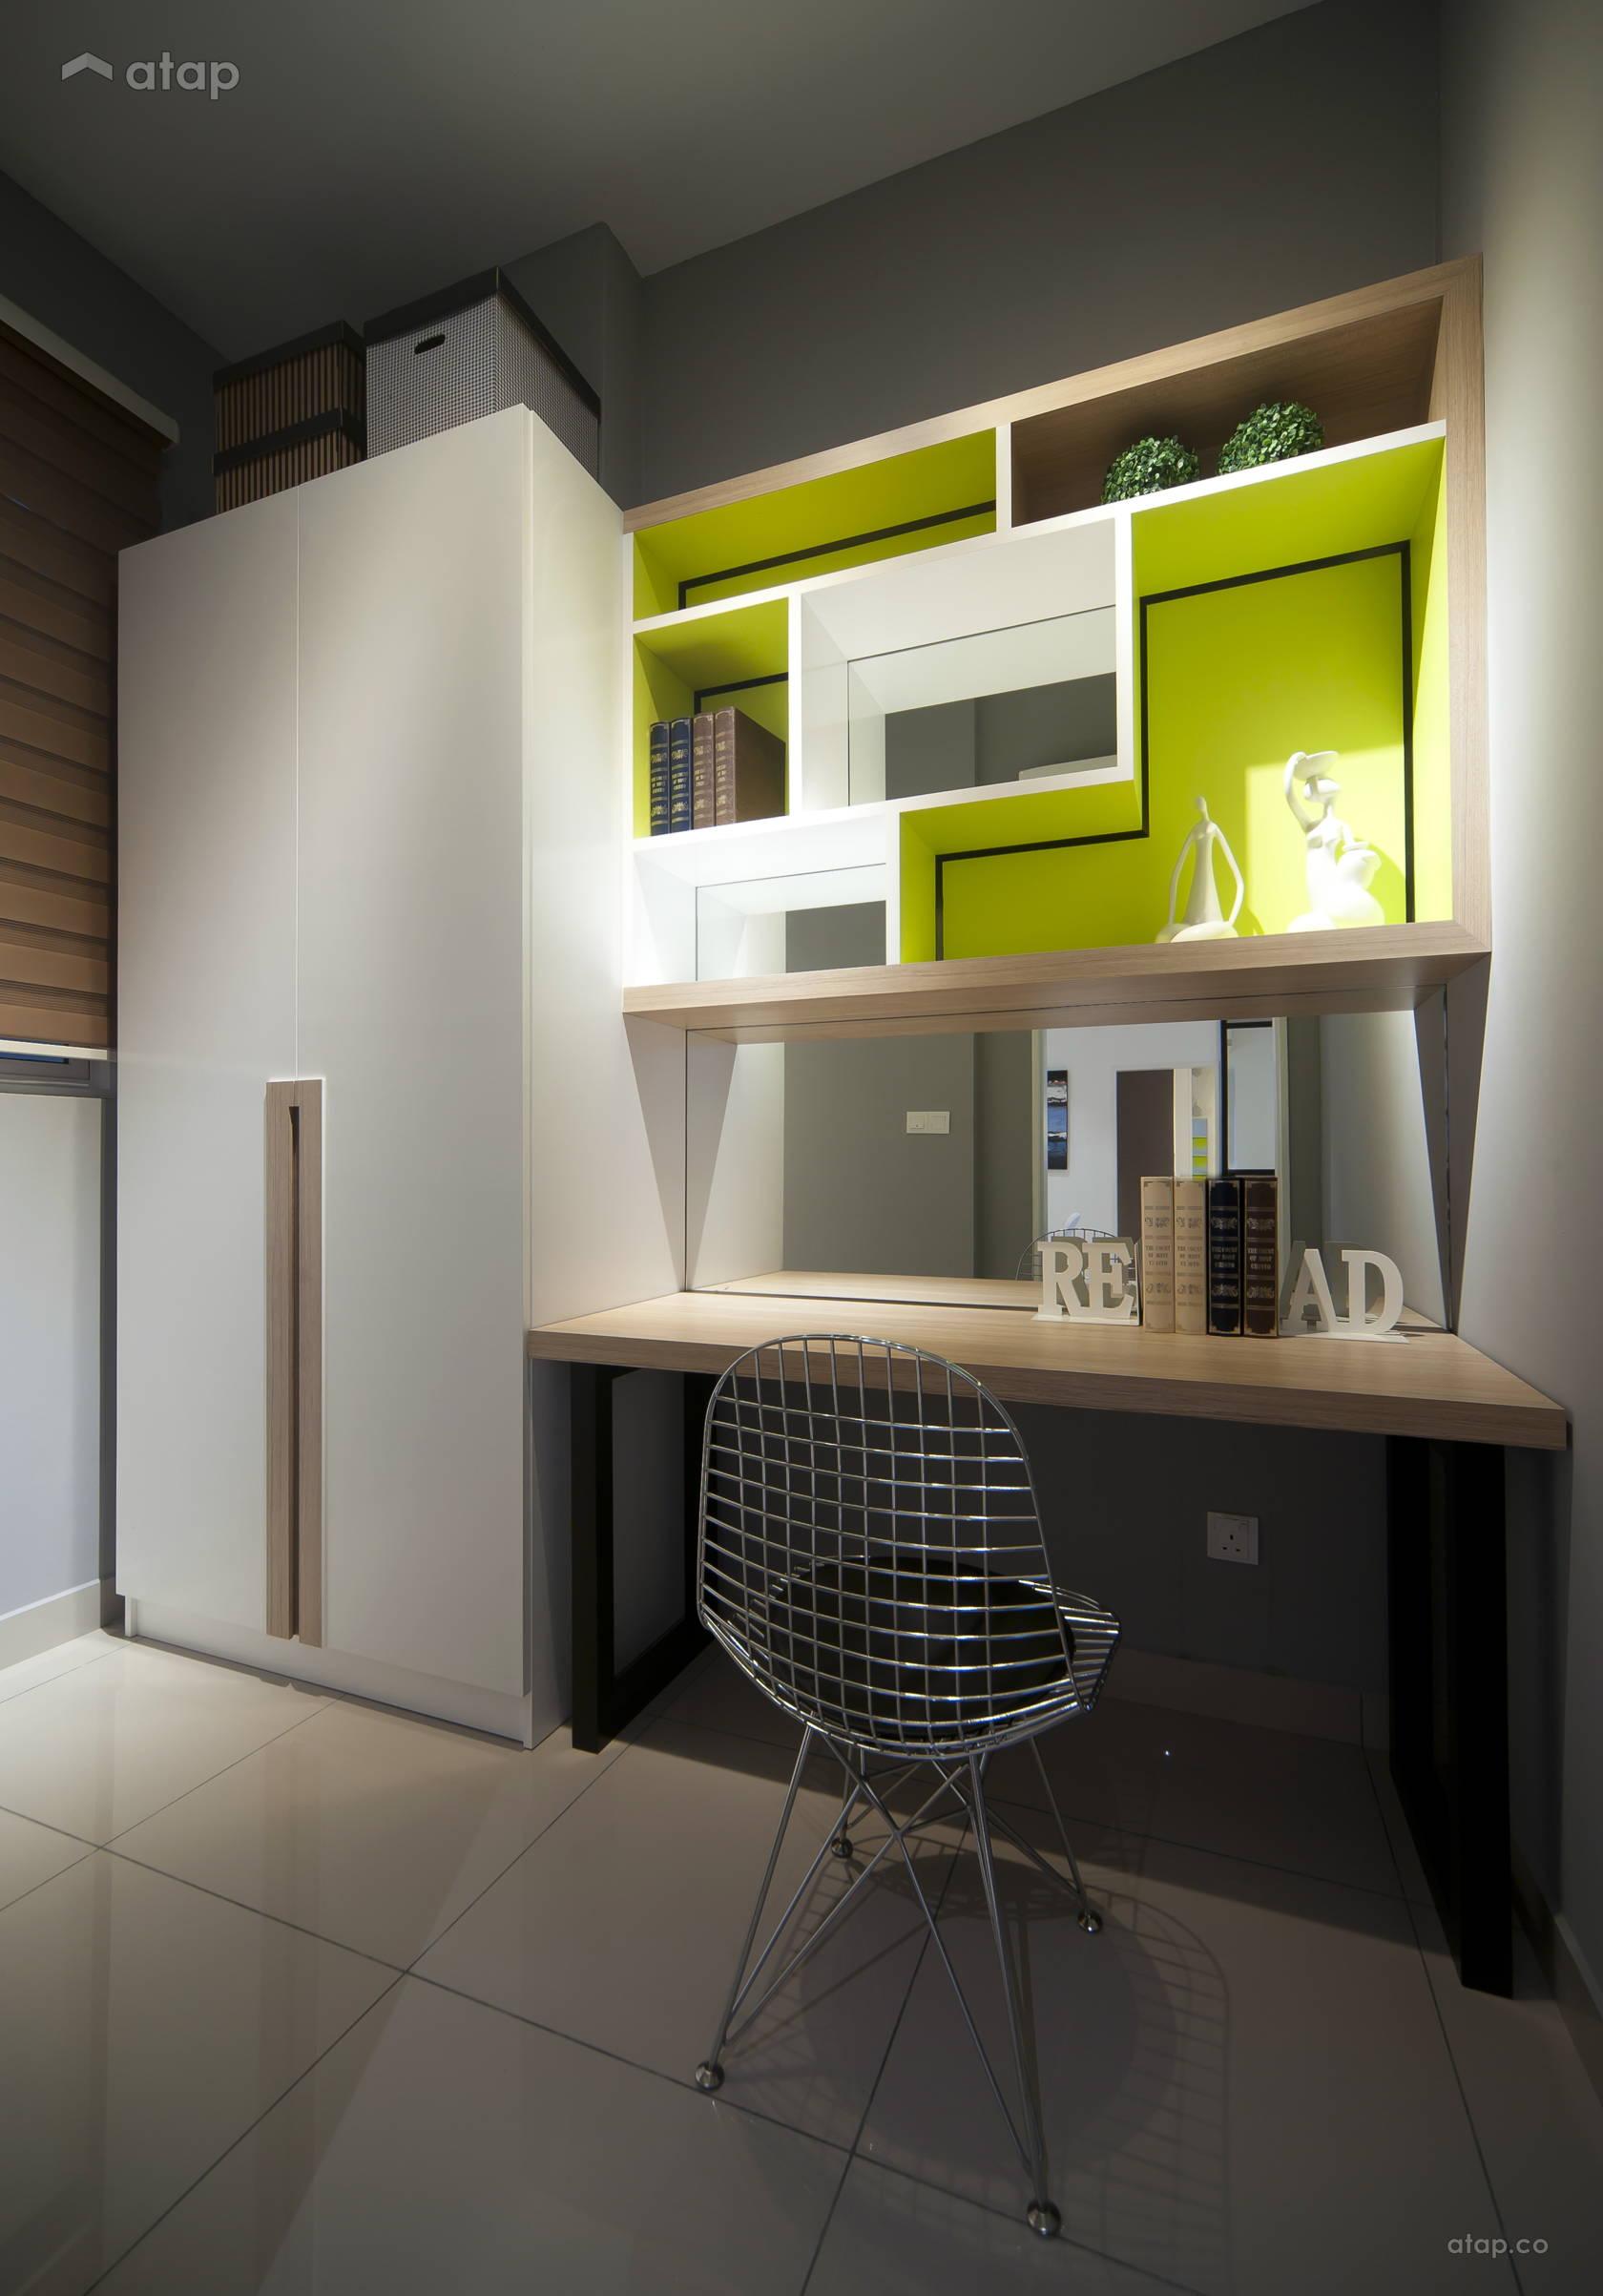 Condominium Study Room: Contemporary Modern Bedroom Study Room Condominium Design